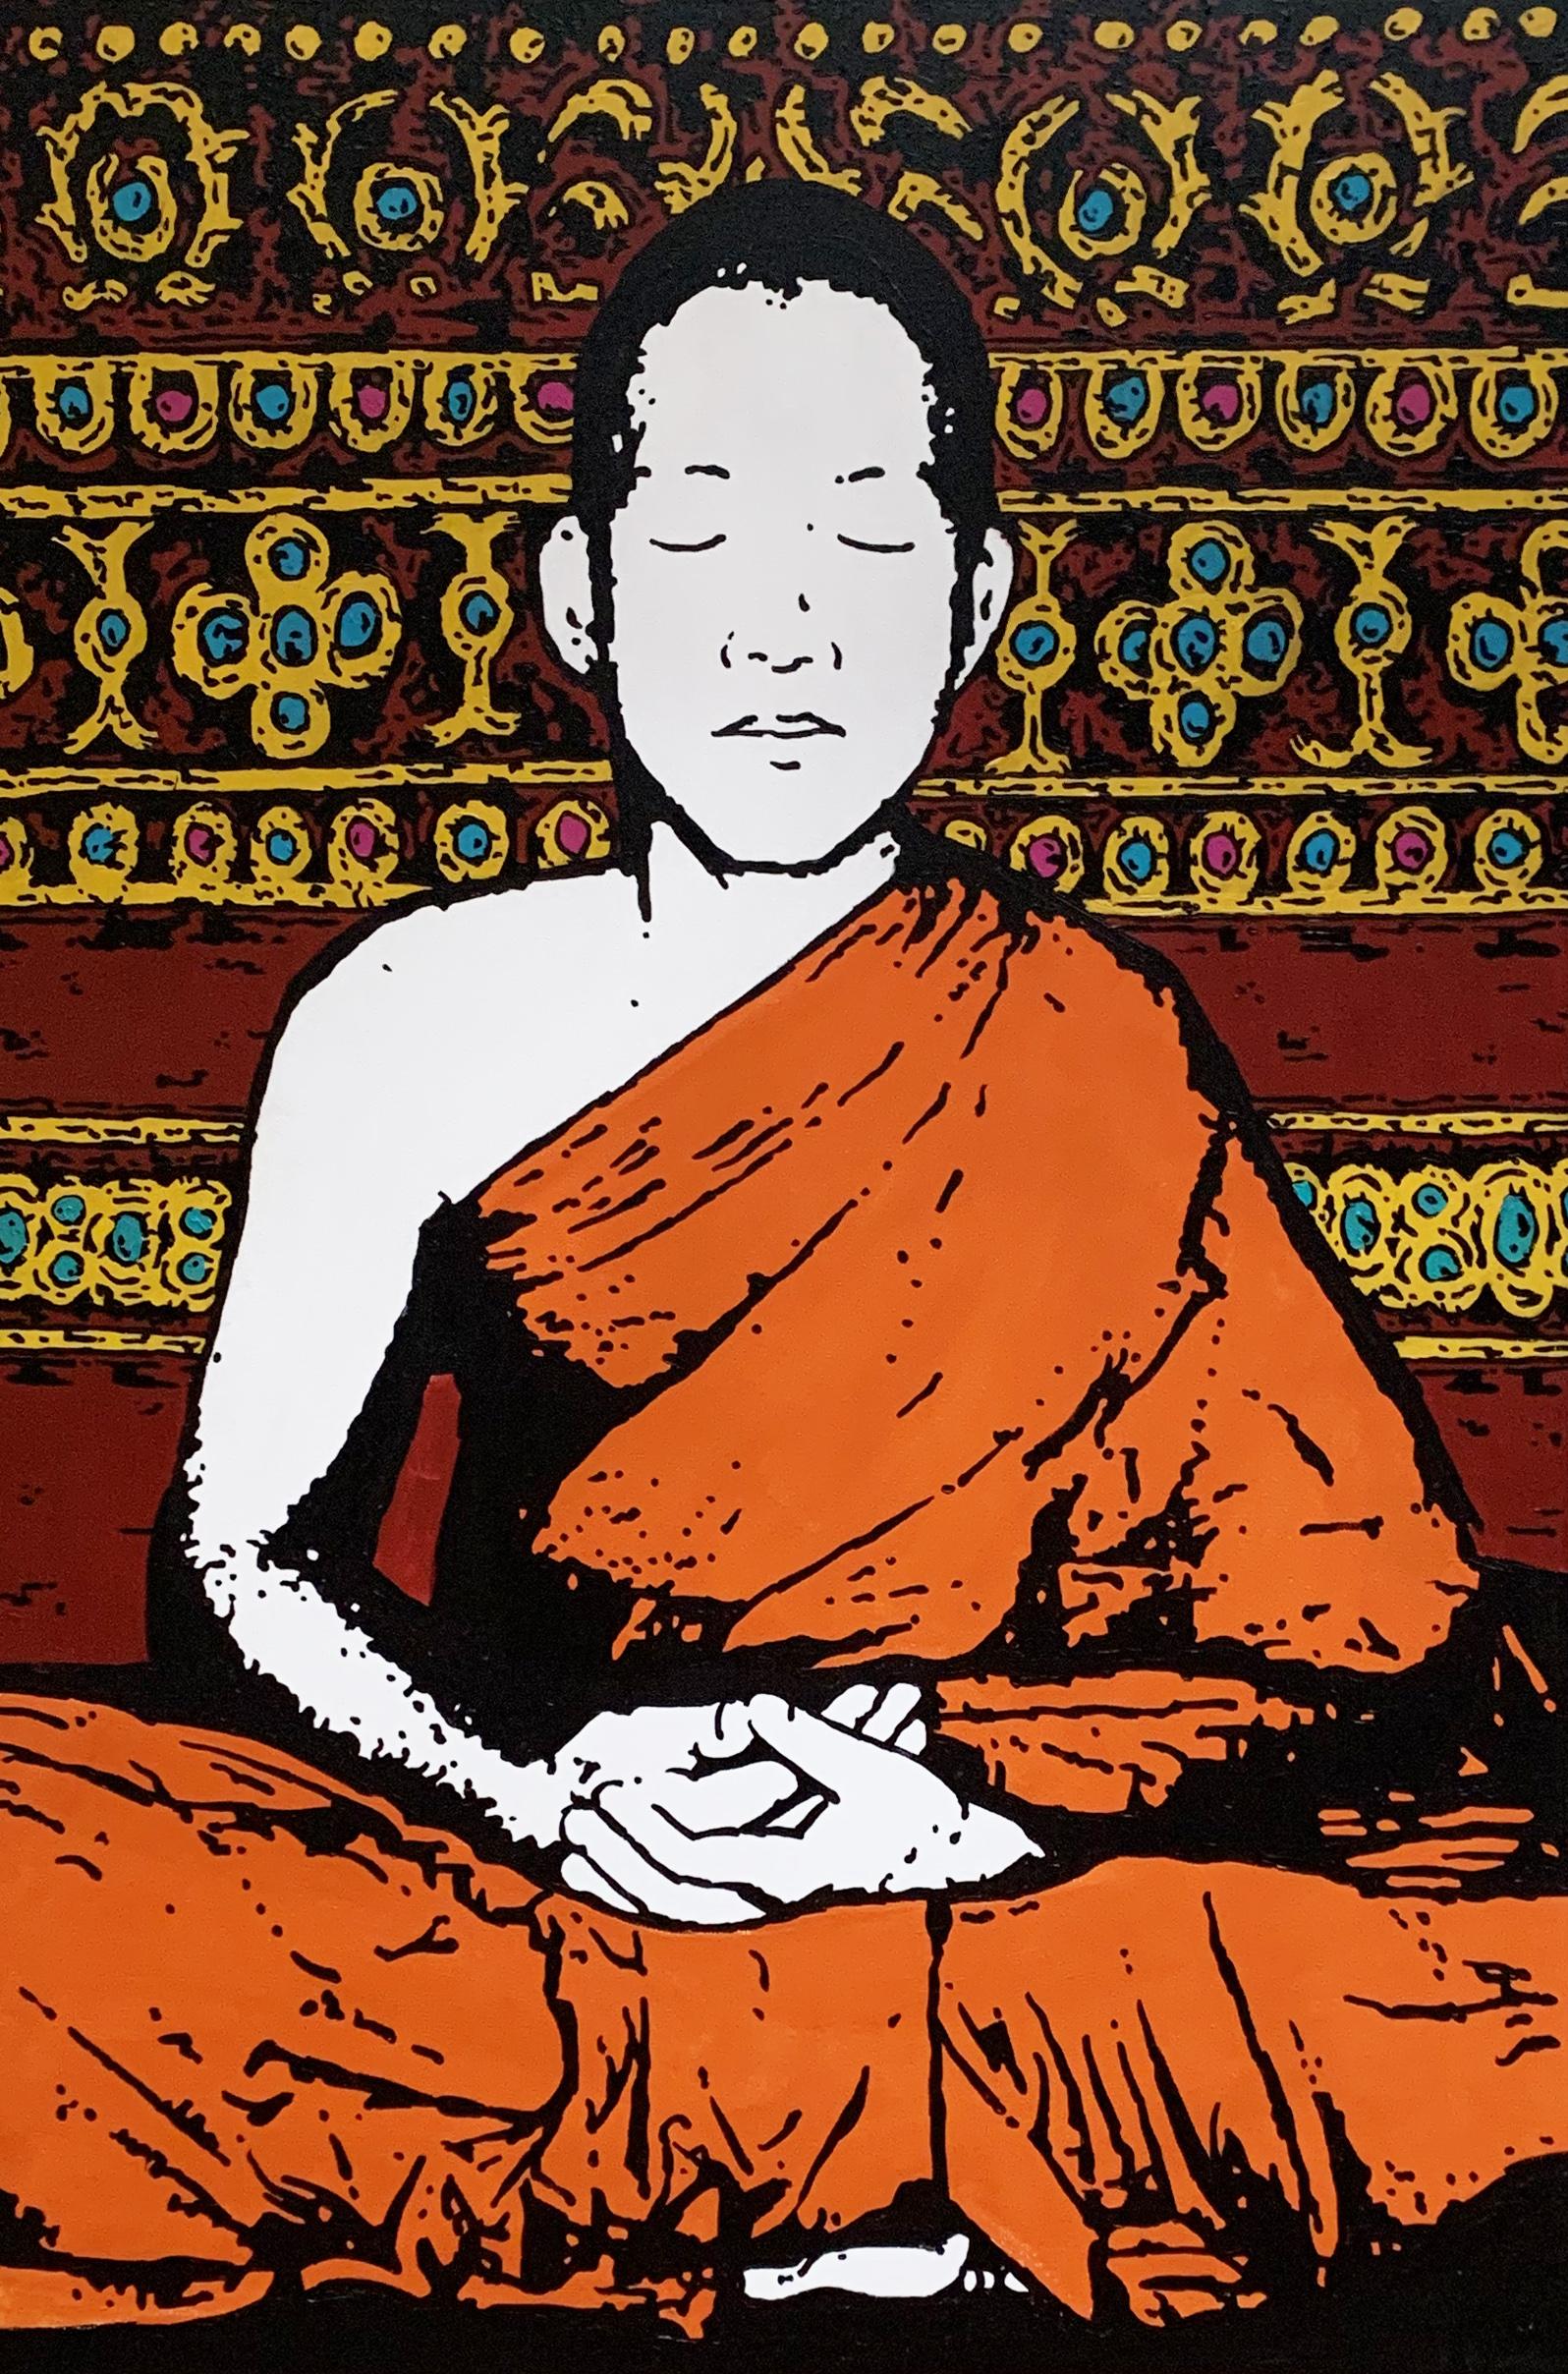 Prayer Monk